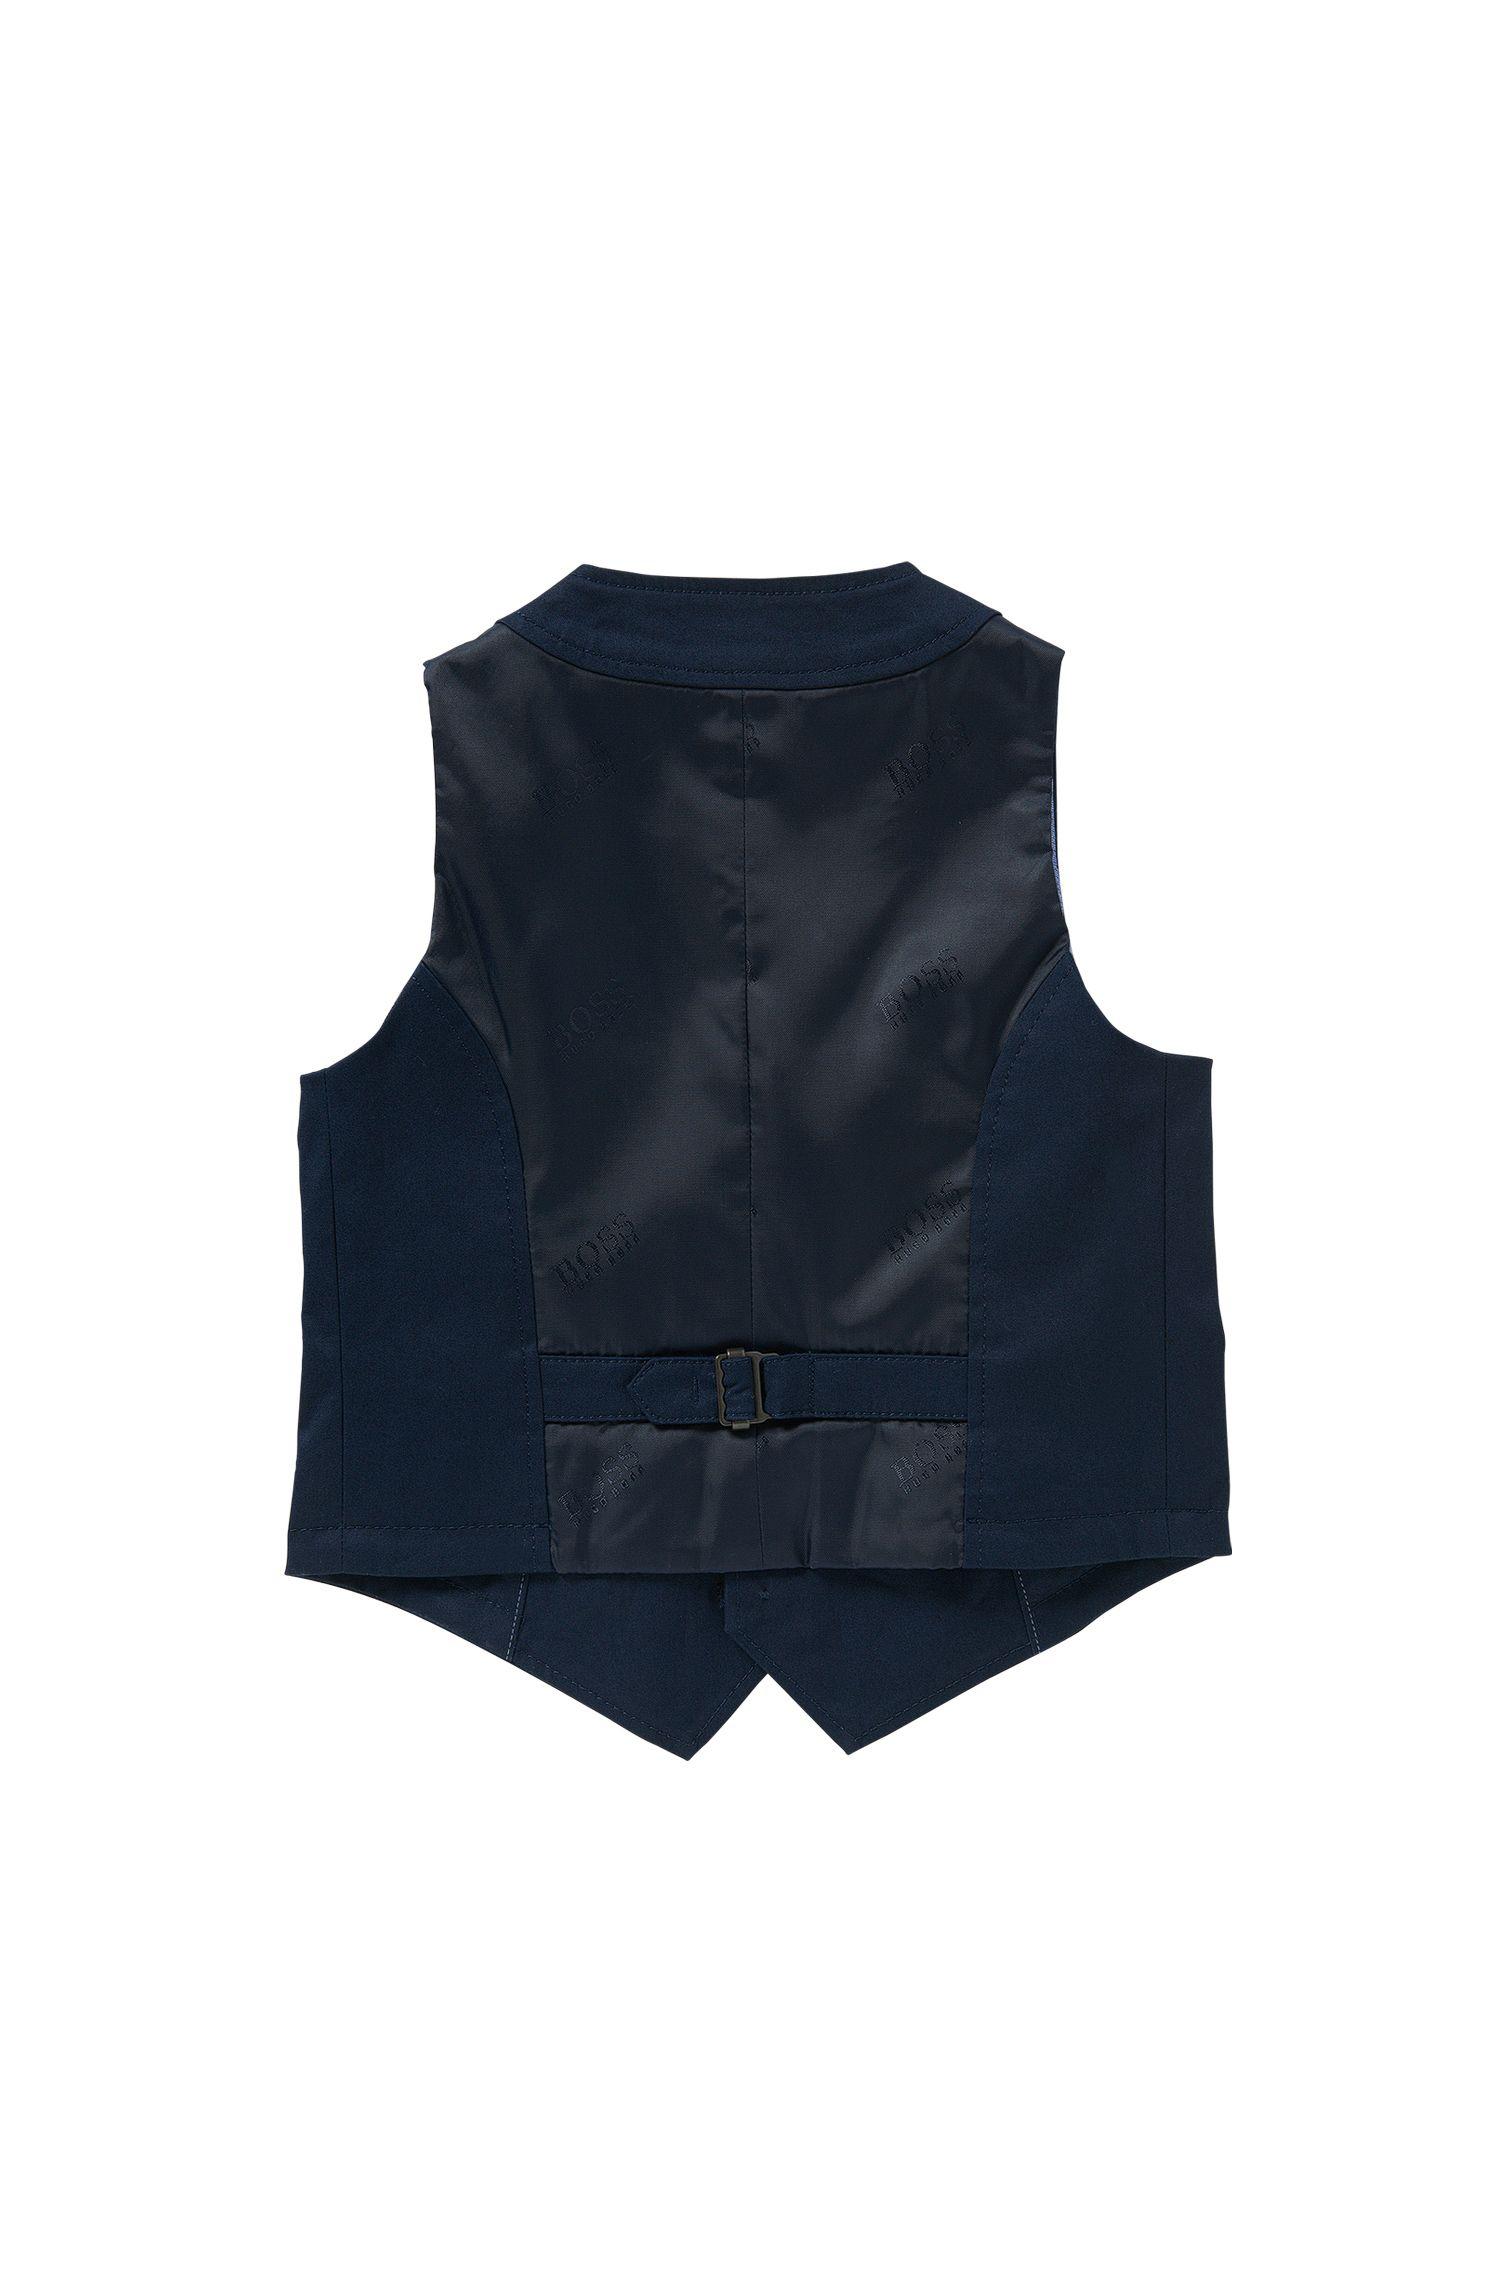 Kids' waistcoat in stretch cotton: 'J25953'